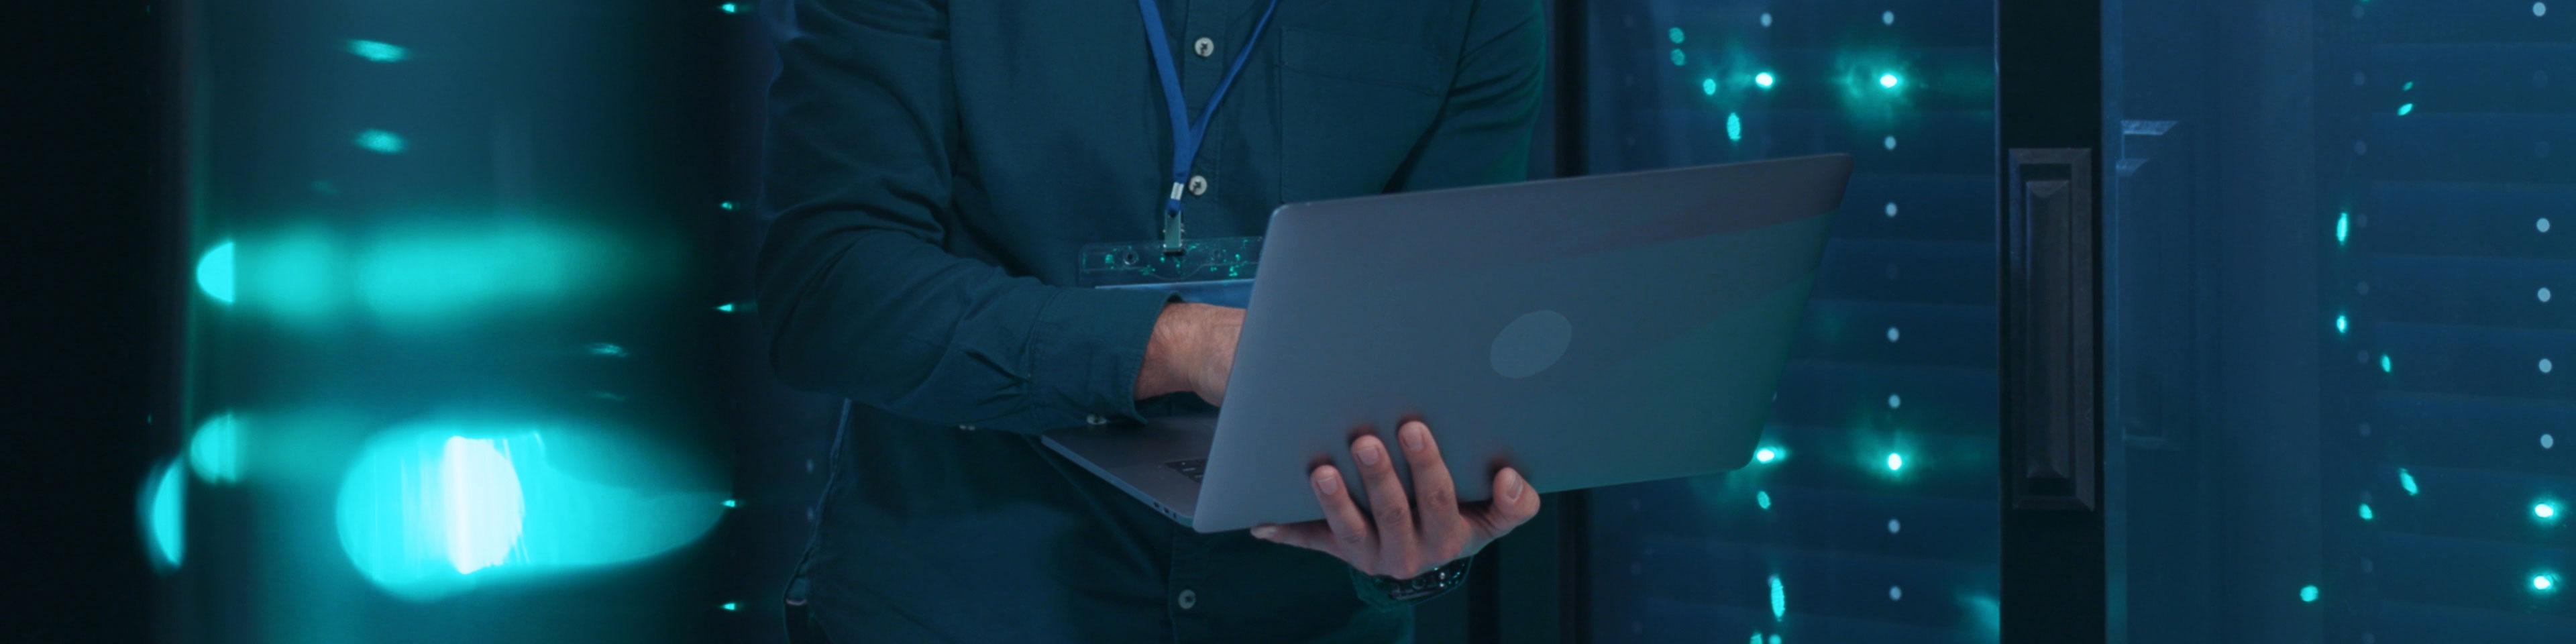 Cybersecurity data center